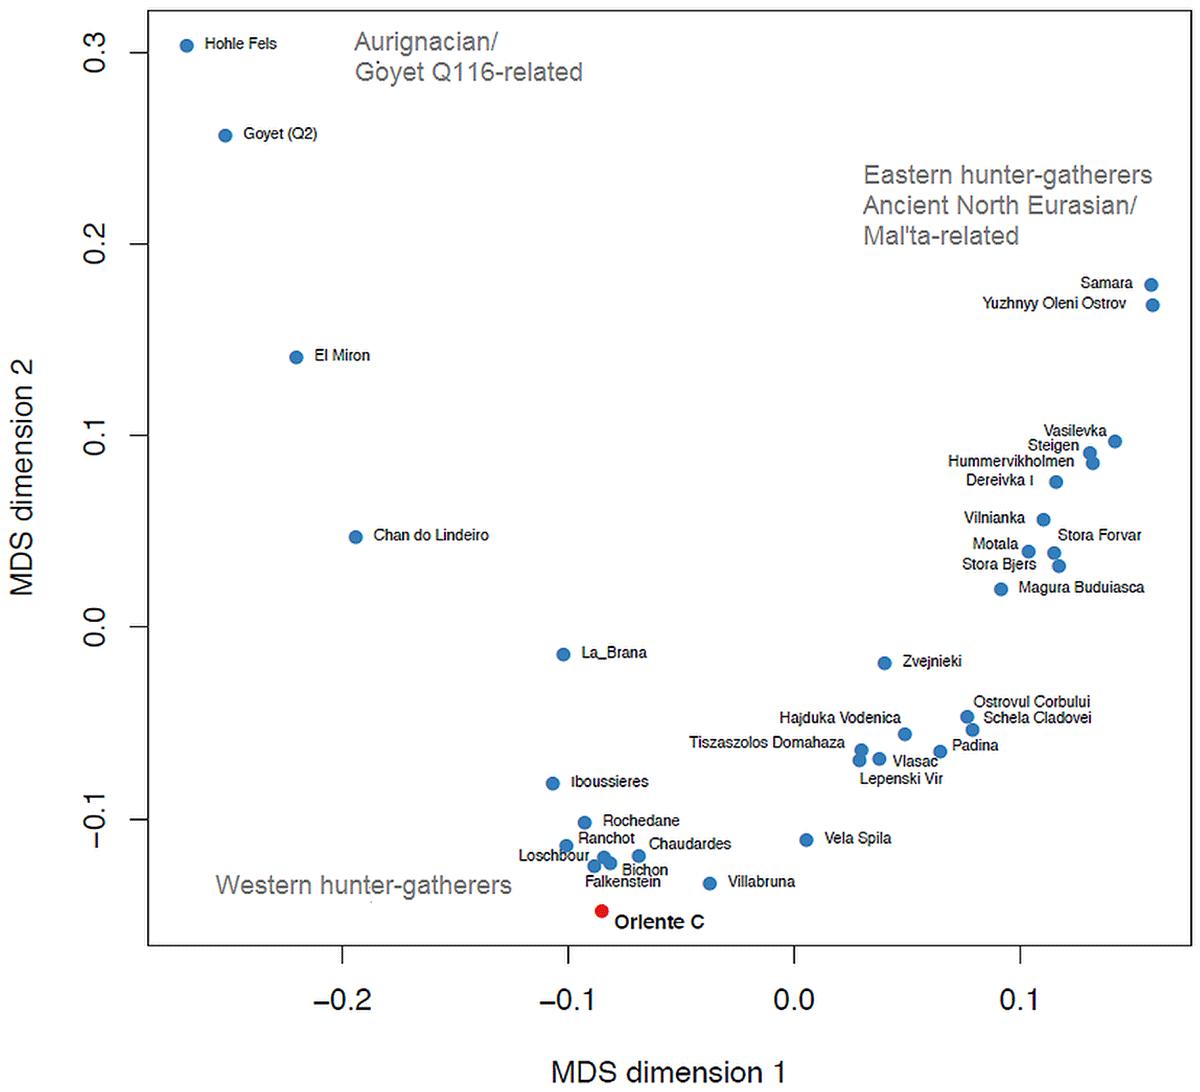 oriente-c-villabruna-f3-statistics